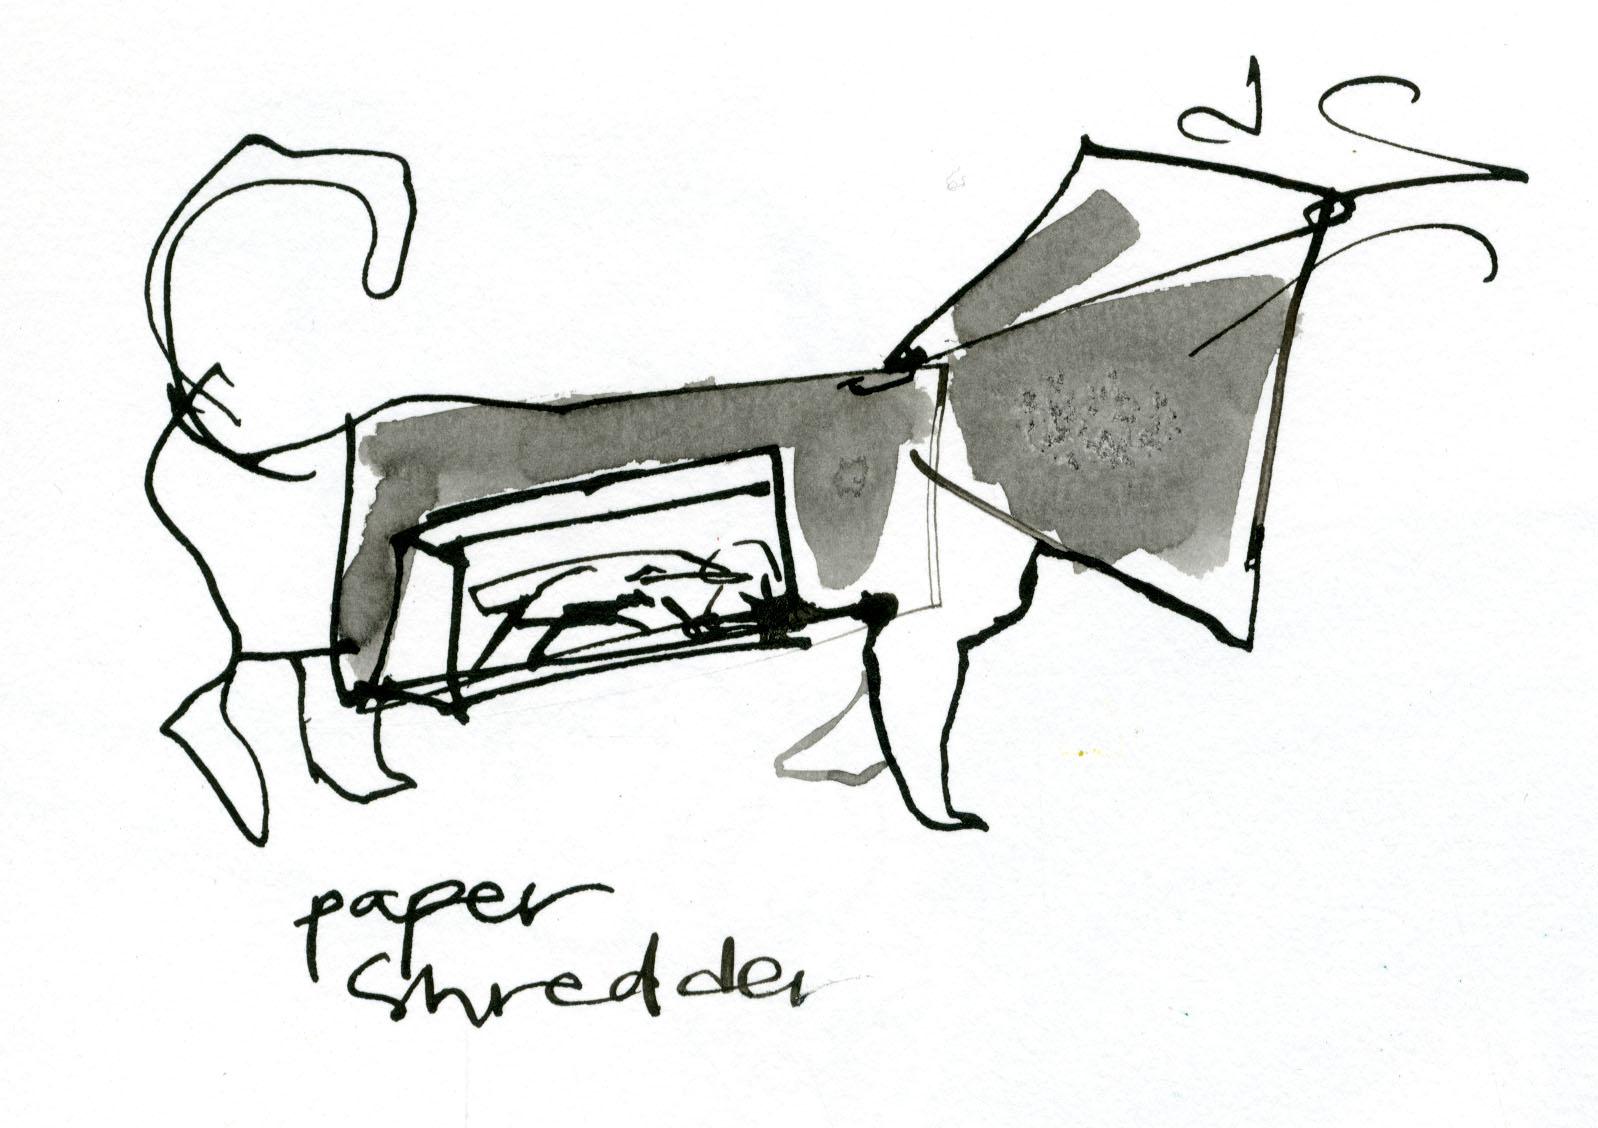 Paper shredder © Carly Larsson 2014